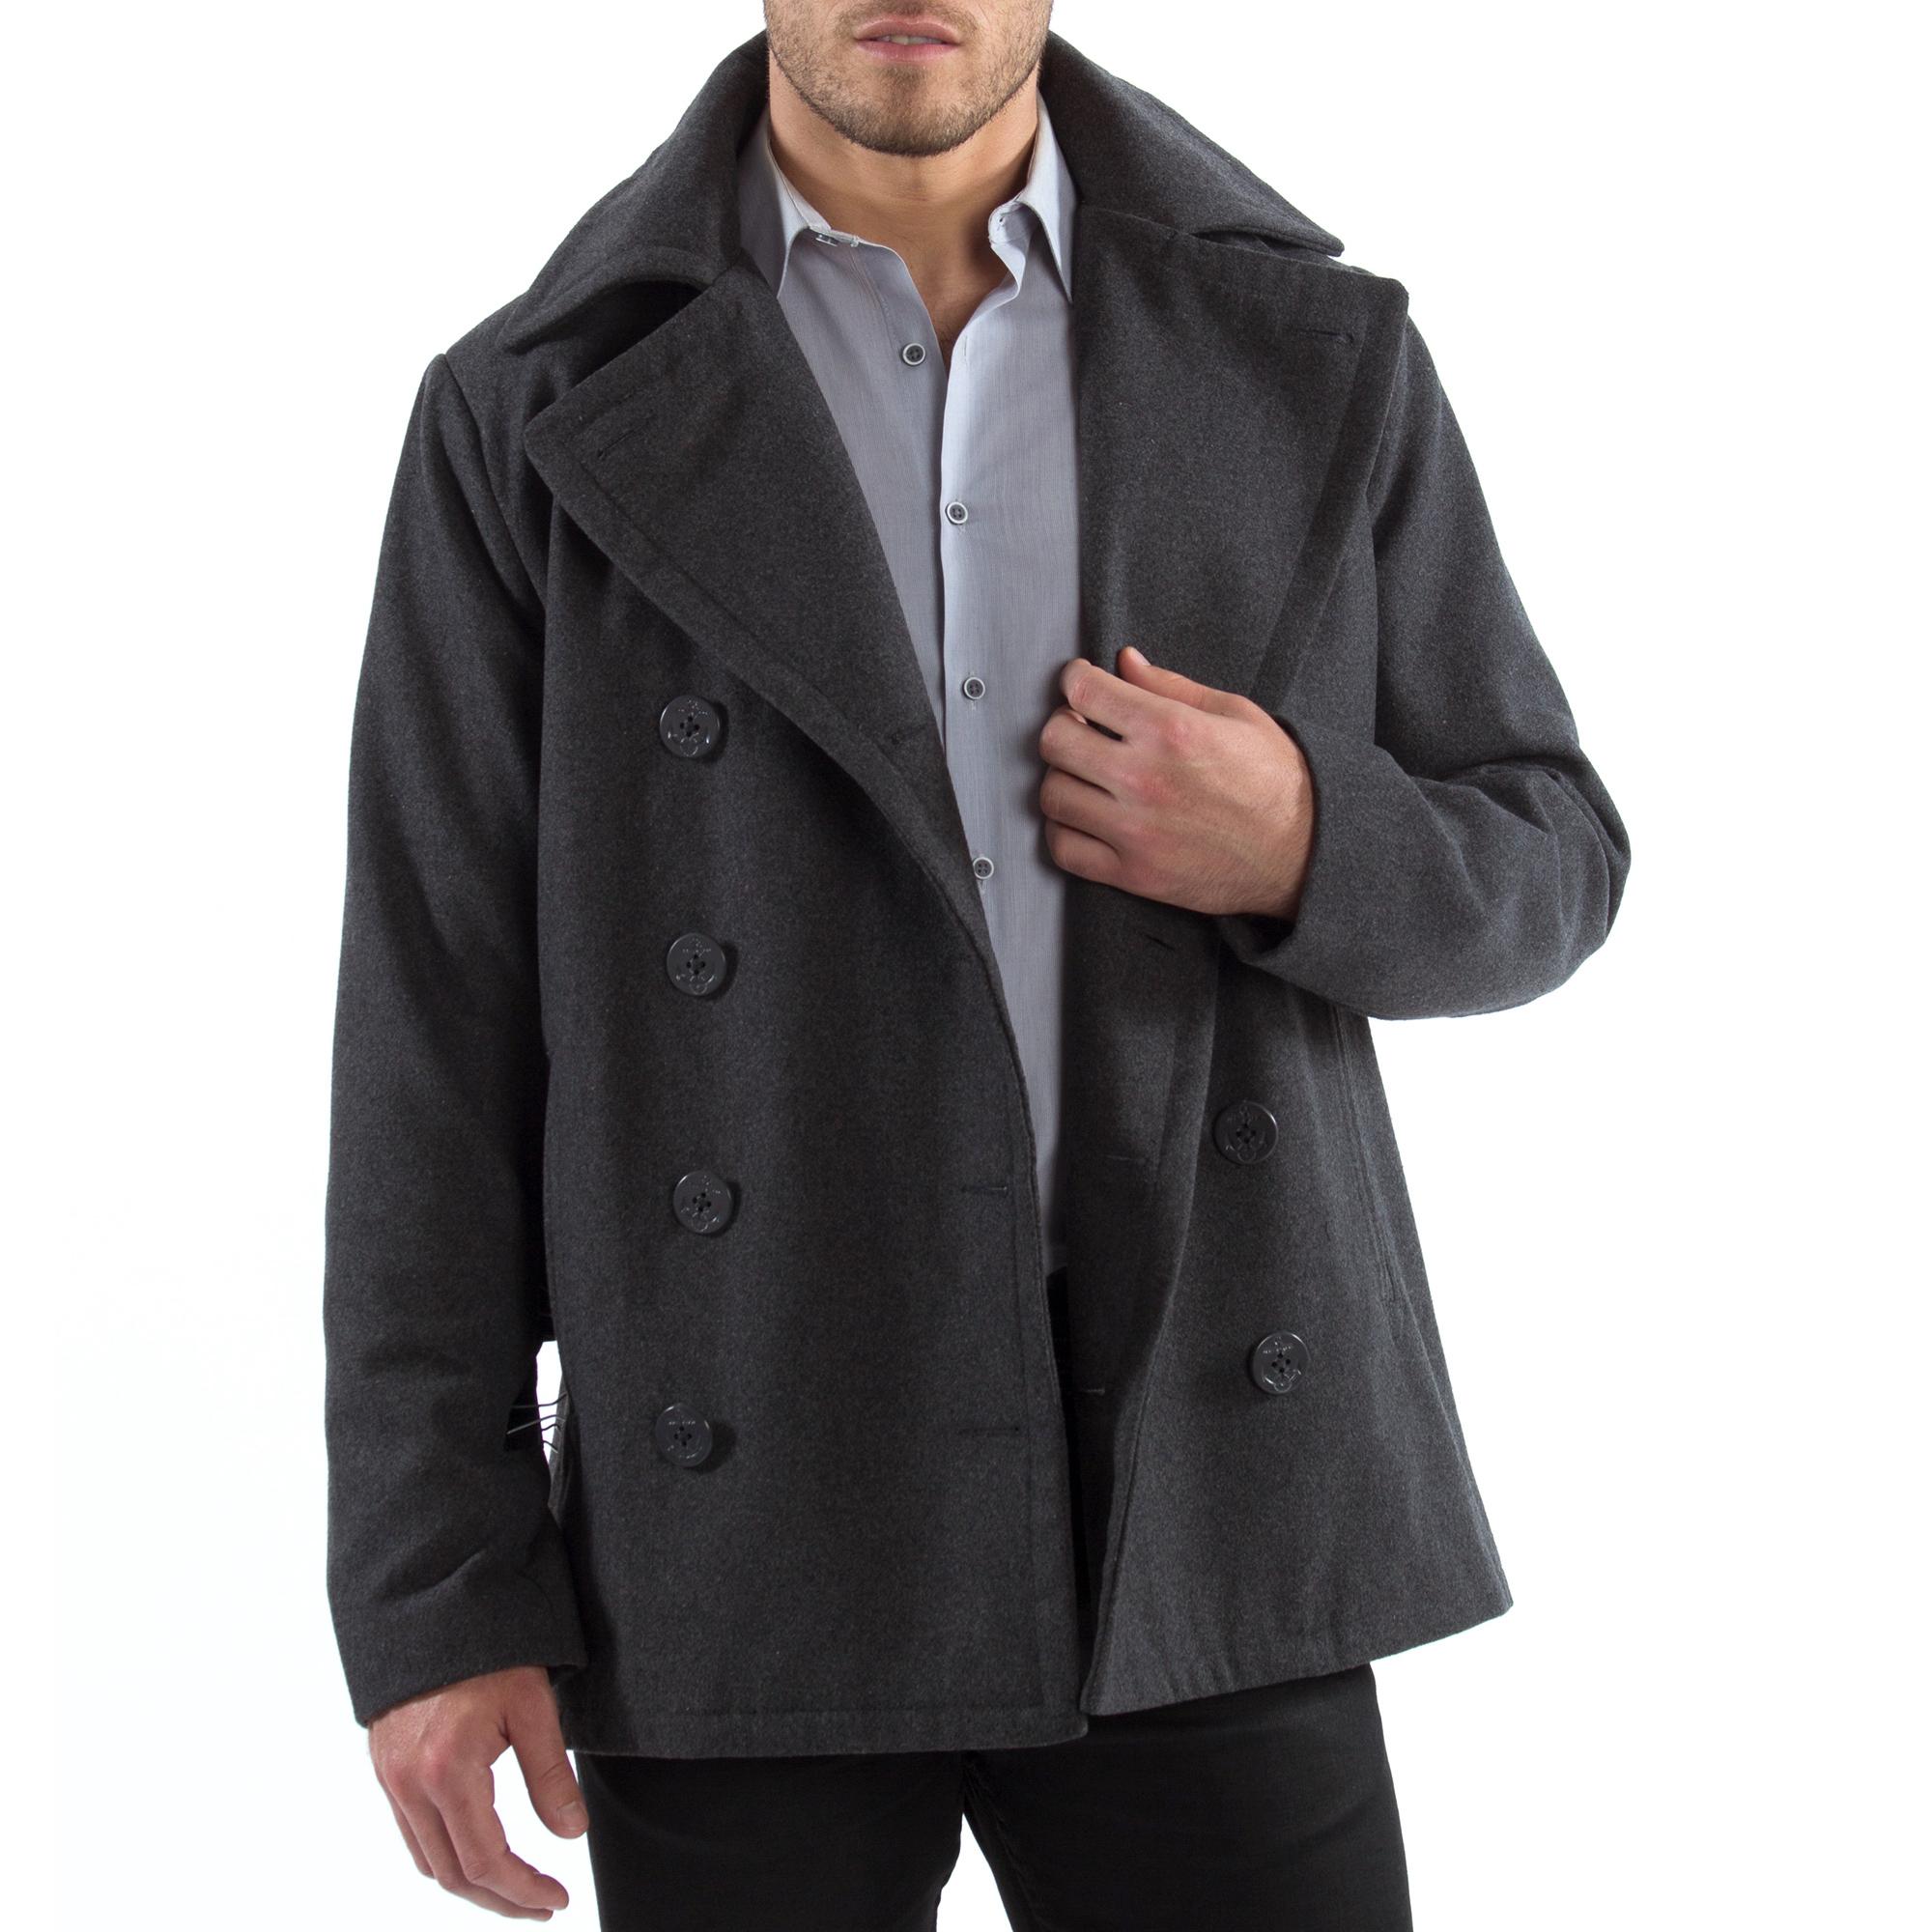 Alpine-Swiss-Mason-Mens-Wool-Blend-Pea-Coat-Jacket-Double-Breasted-Dress-Coat thumbnail 29